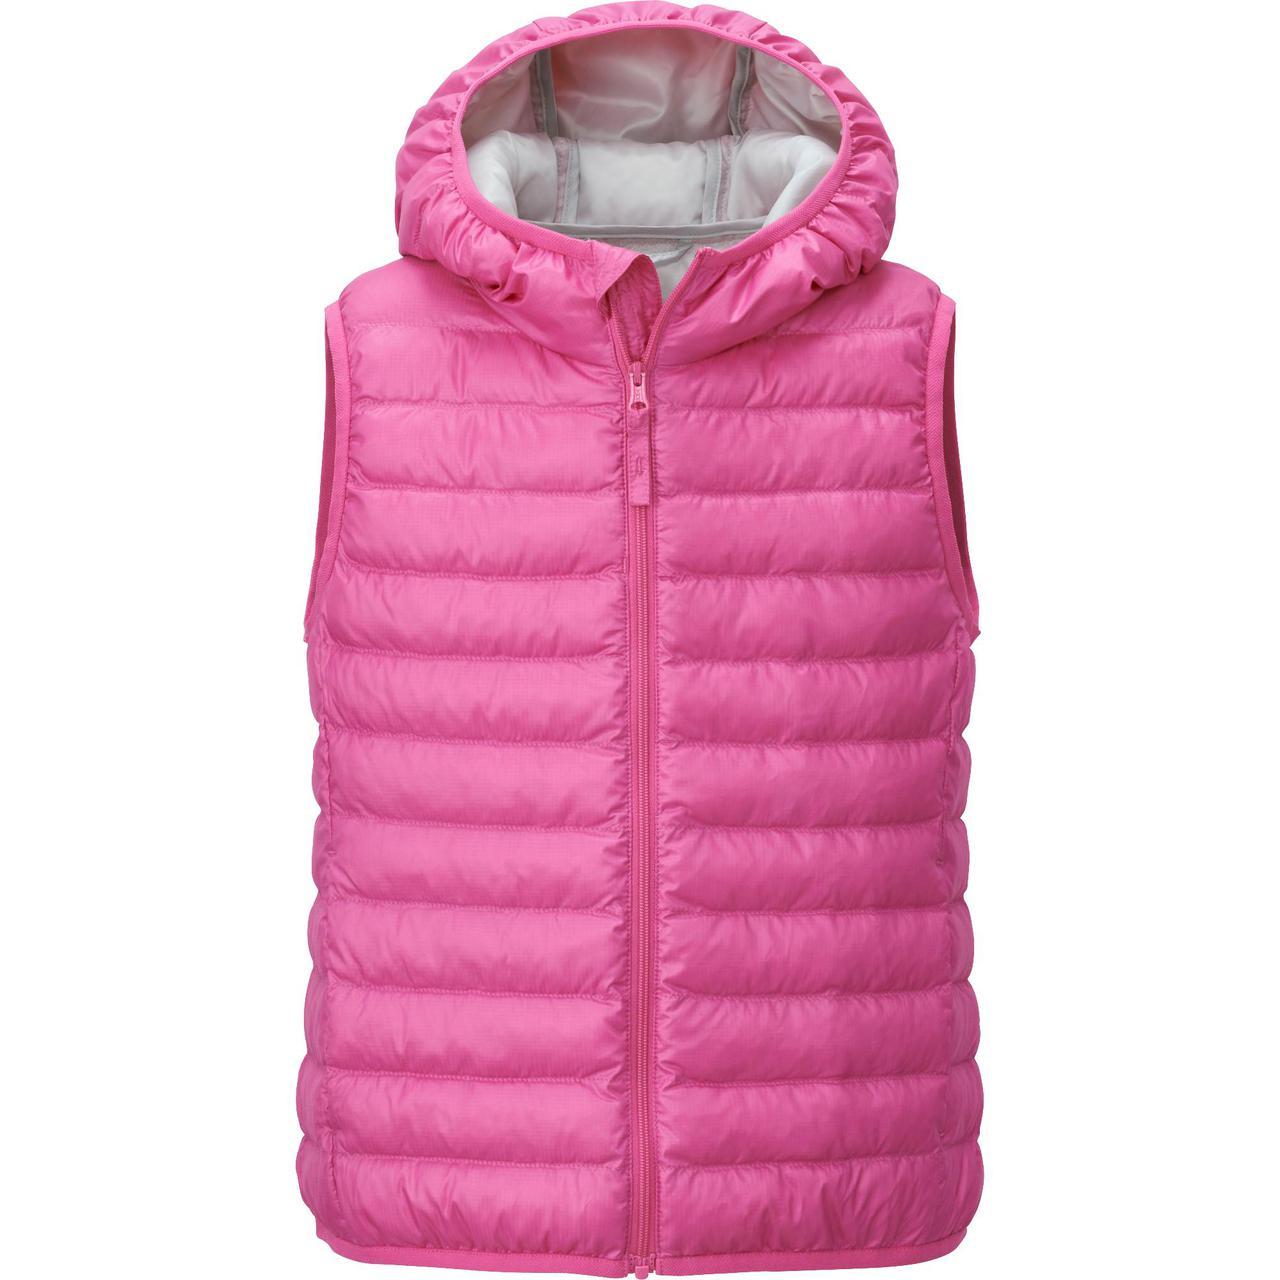 Жилетка Uniqlo girls light warm padded vest Pink